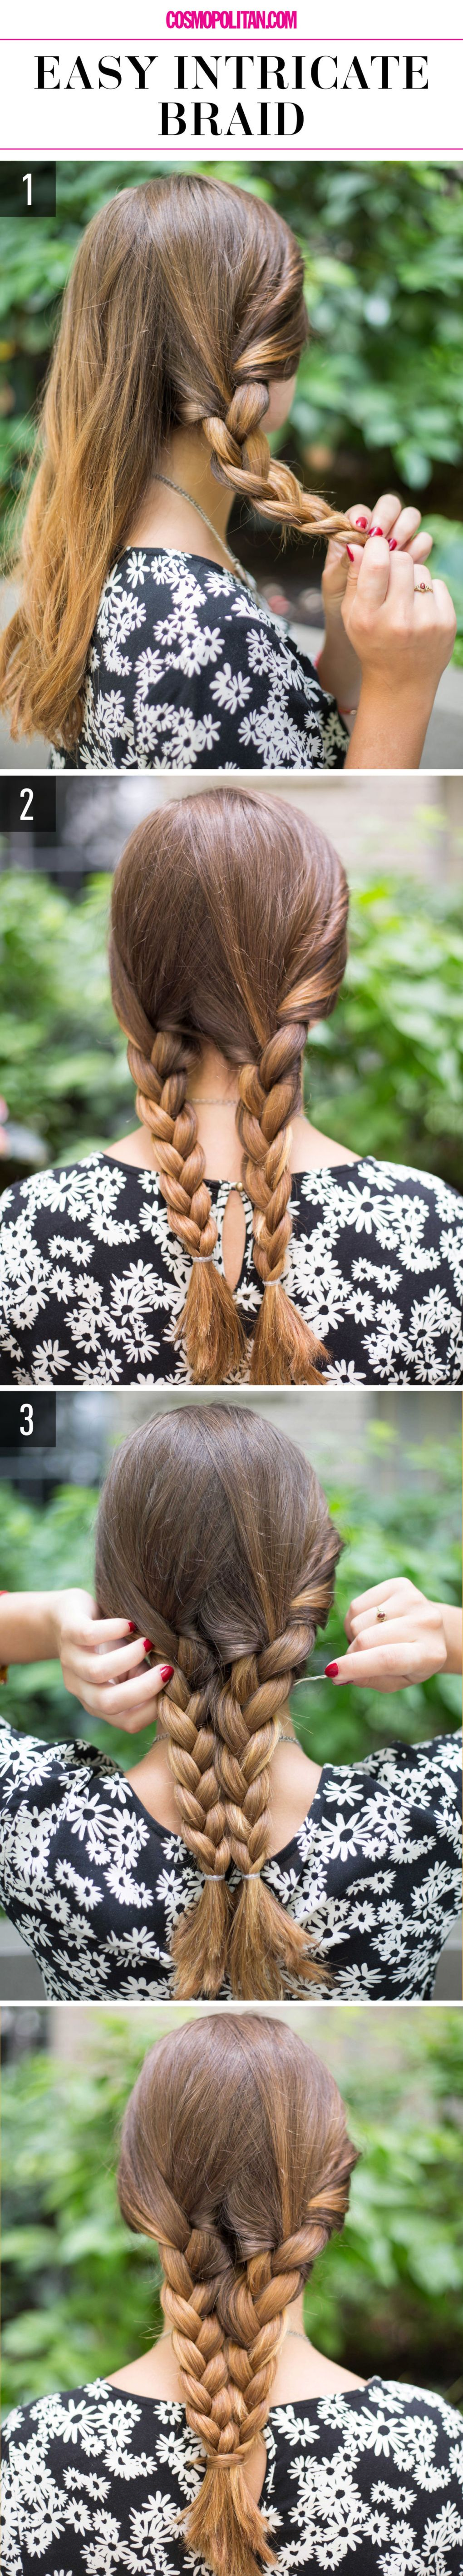 Easy Intricate Braid